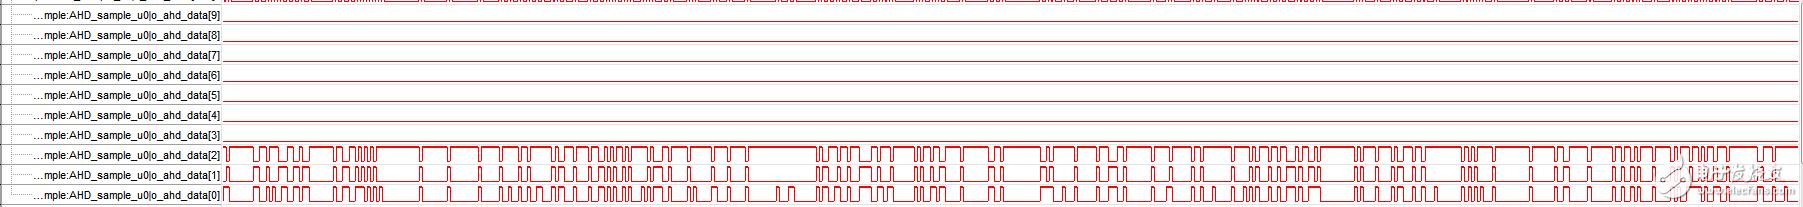 AD9211接FPGA输出波形问题